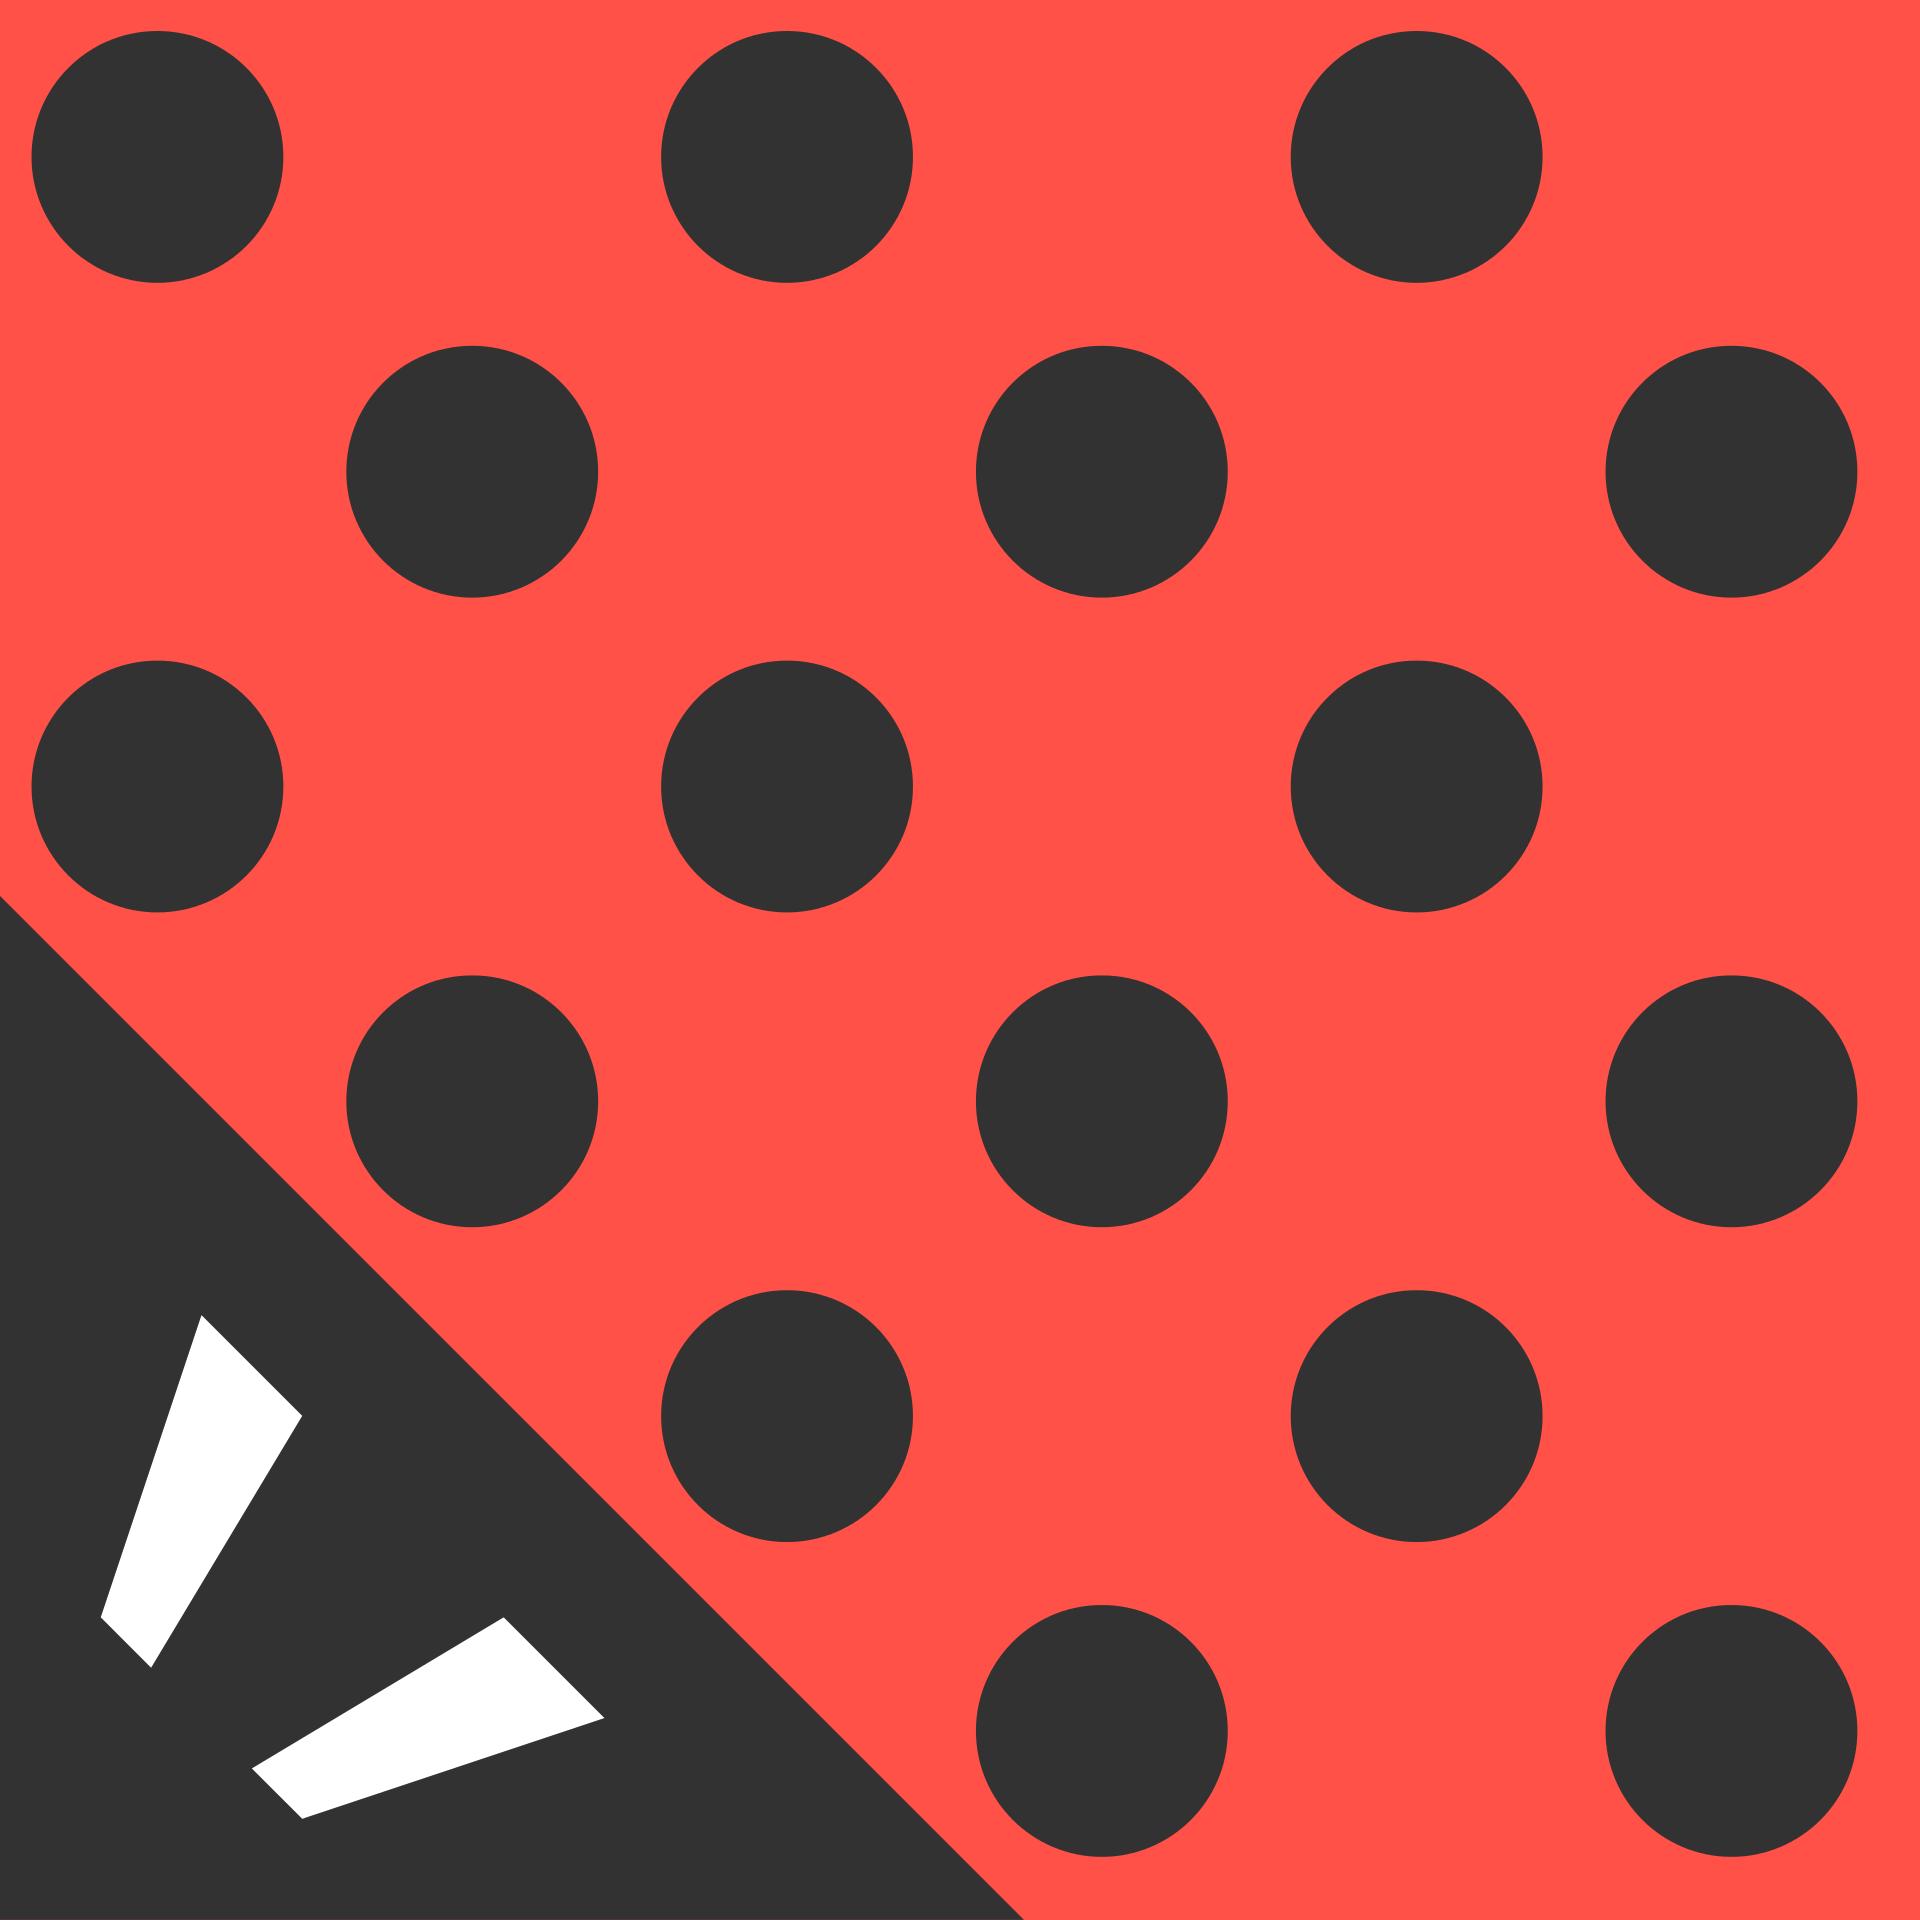 bicho, mariquita, lunares, insecto, rojo, 1608280930